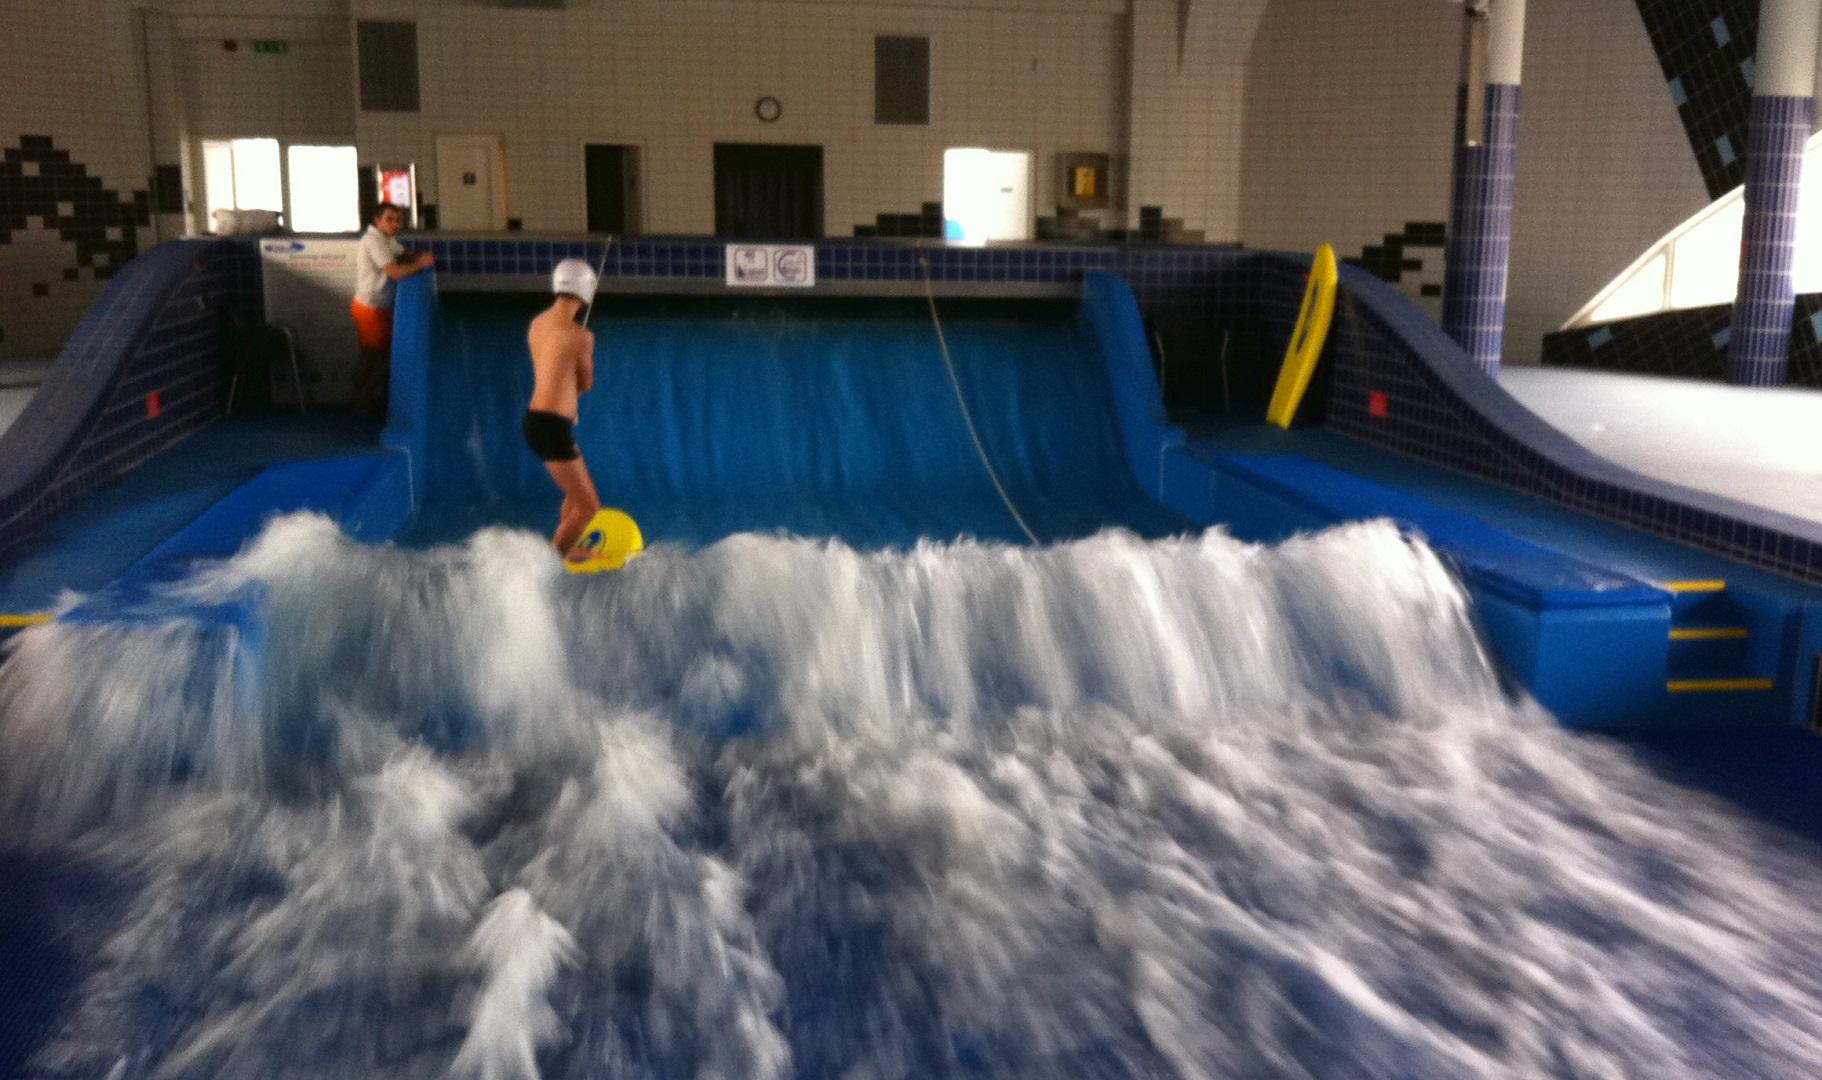 Hajduszoboszlo latnivalok szörf gyogyfurdo Hungarospa